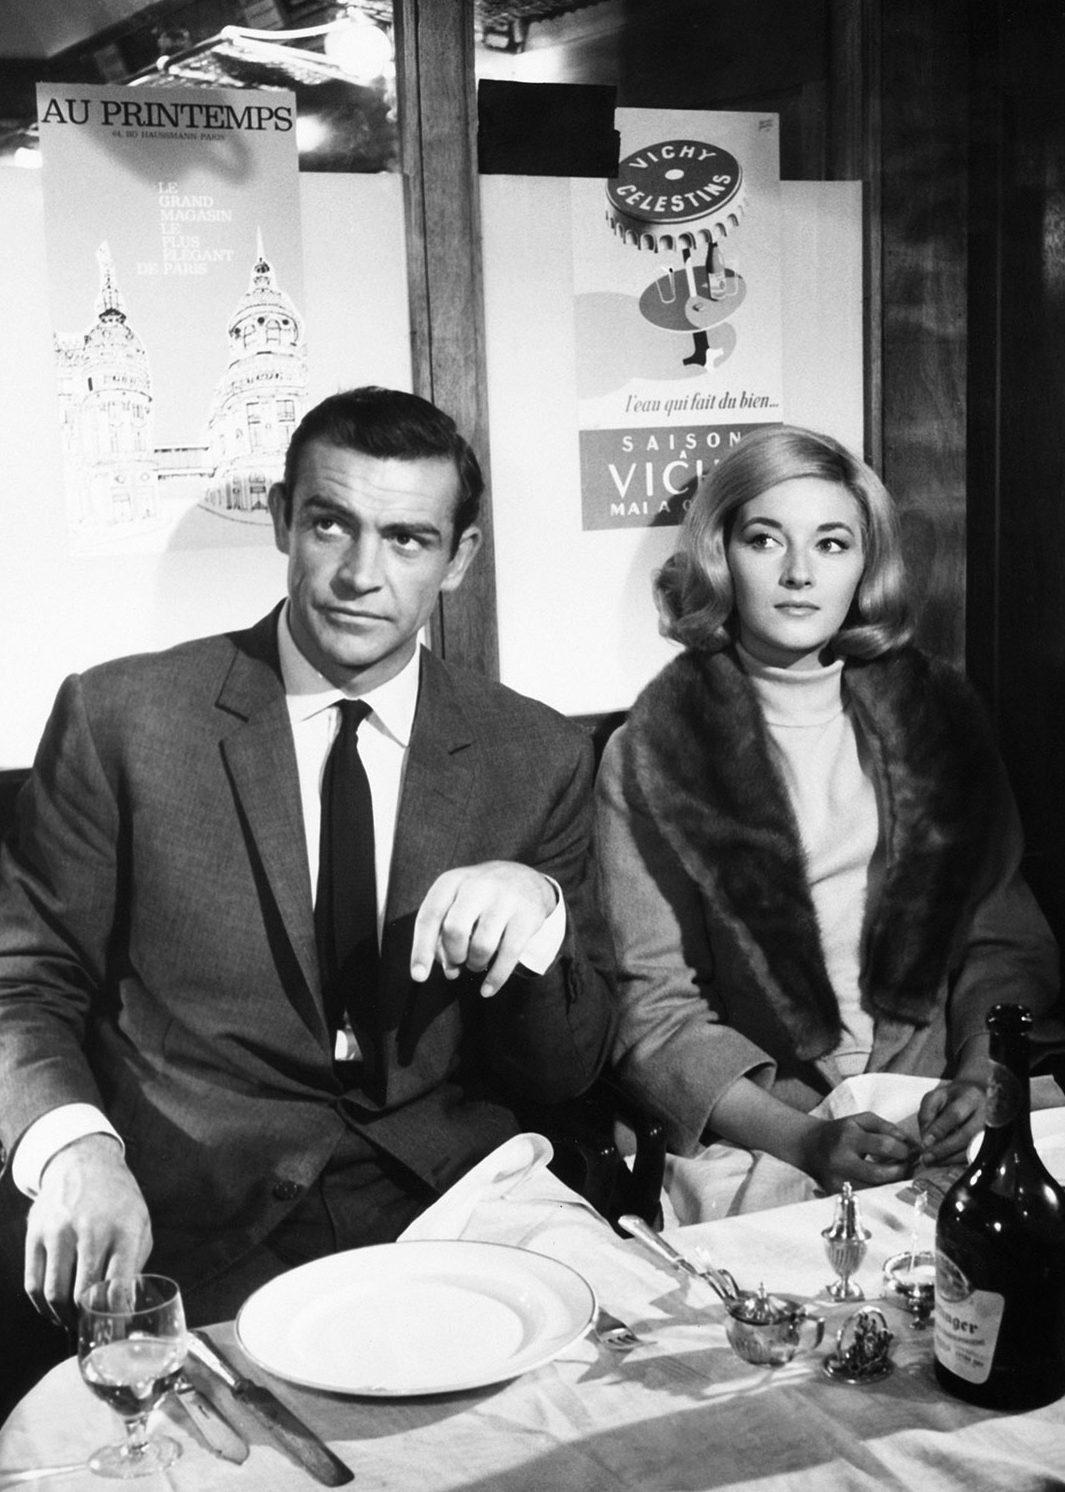 Celebrating Sean Connery's Film Career